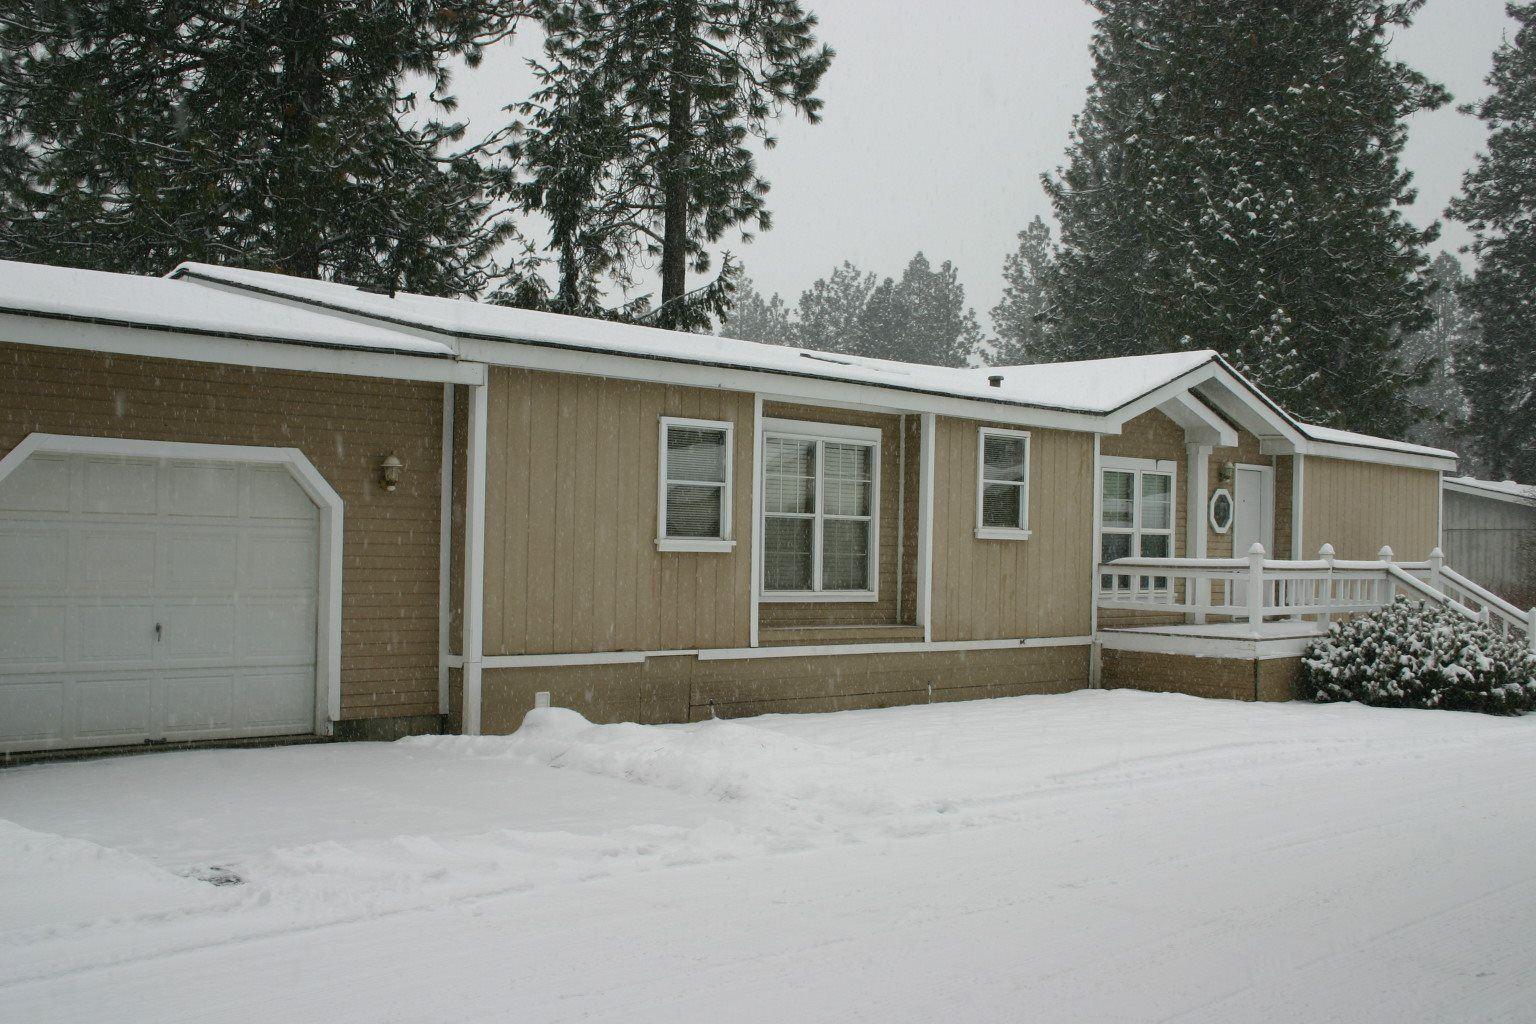 14823 N Shenandoah Forest Ln, Mead, WA 99021 - #: 202111594